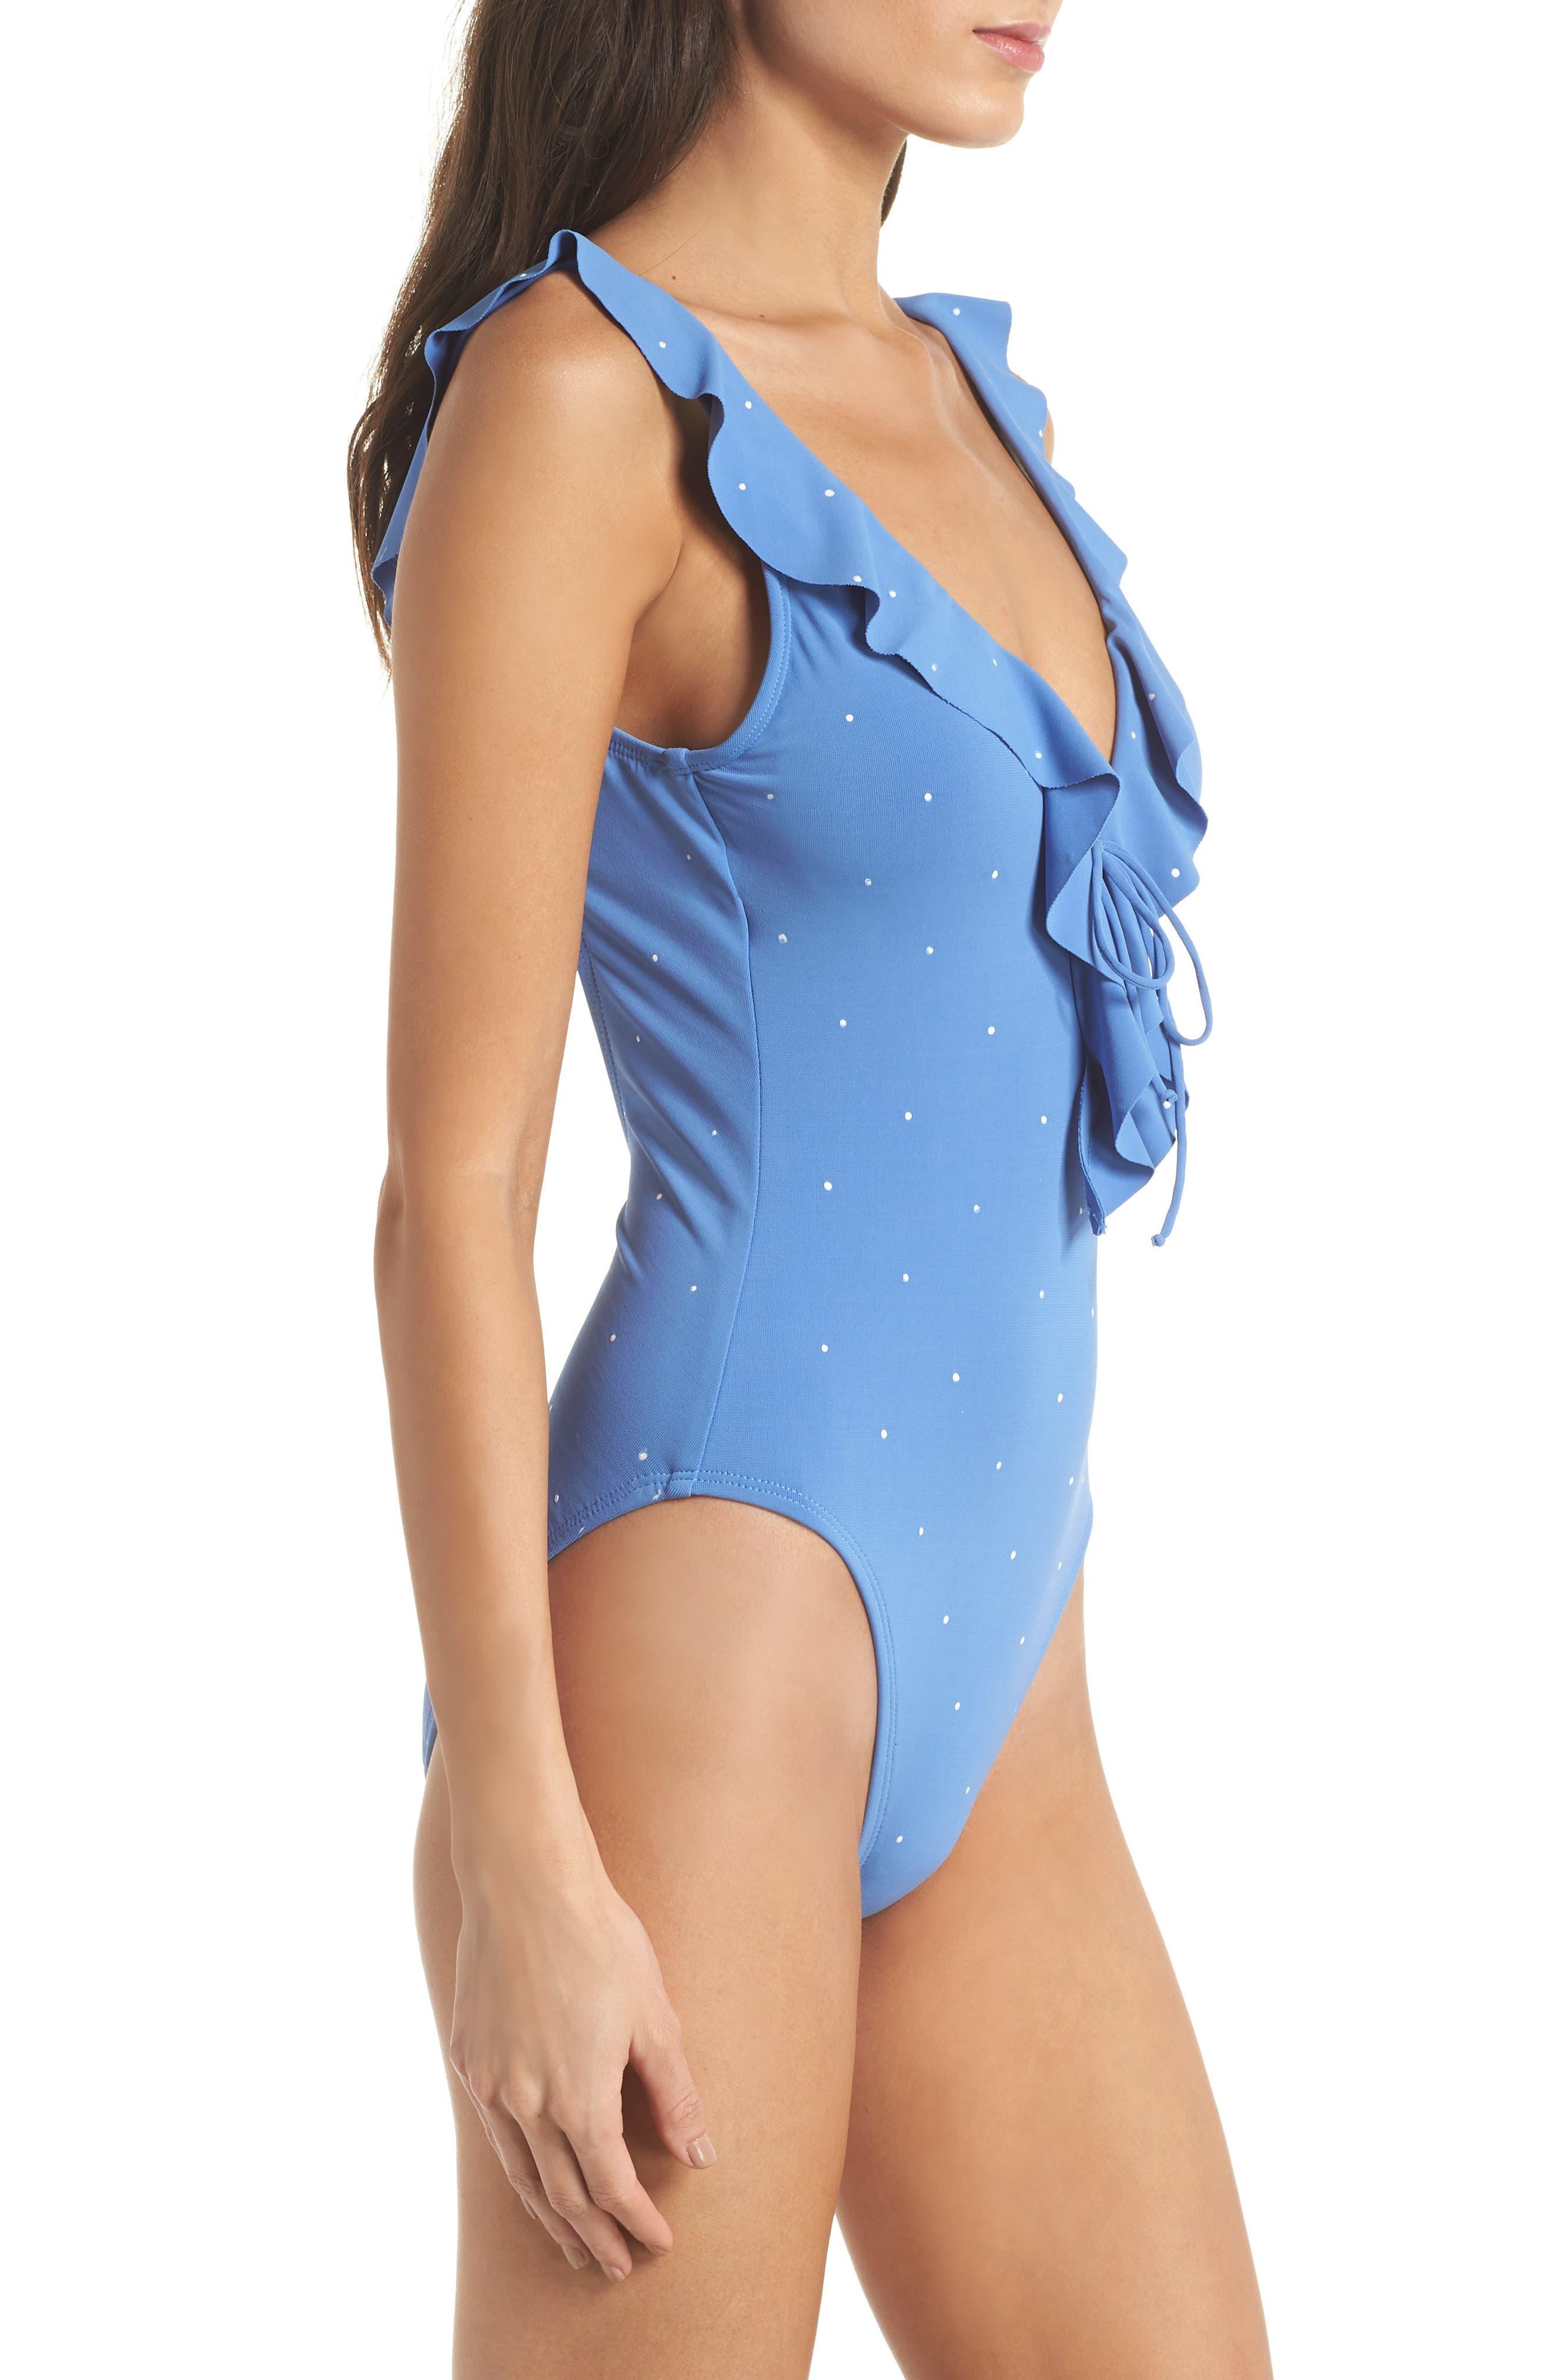 Jennie Plunge One-Piece Swimsuit,                             Alternate thumbnail 3, color,                             Periwinkle